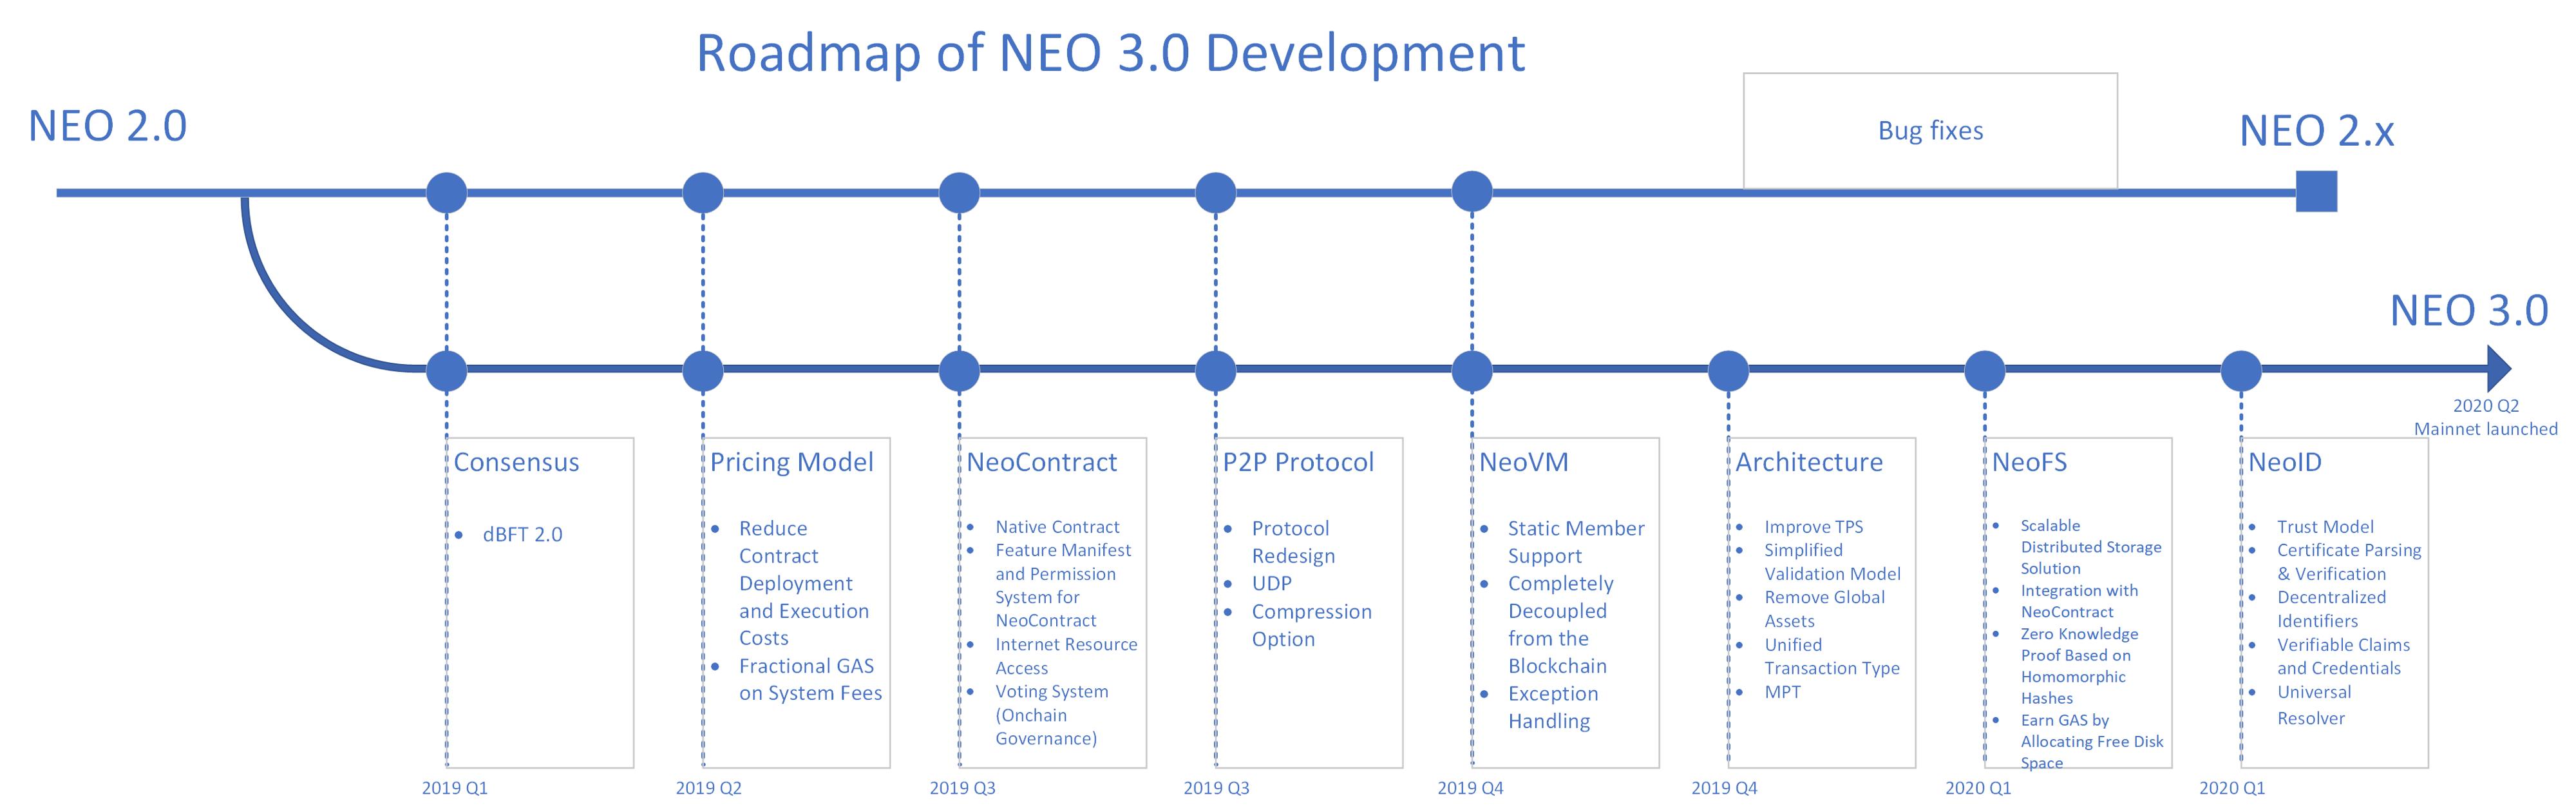 NEO roadmap